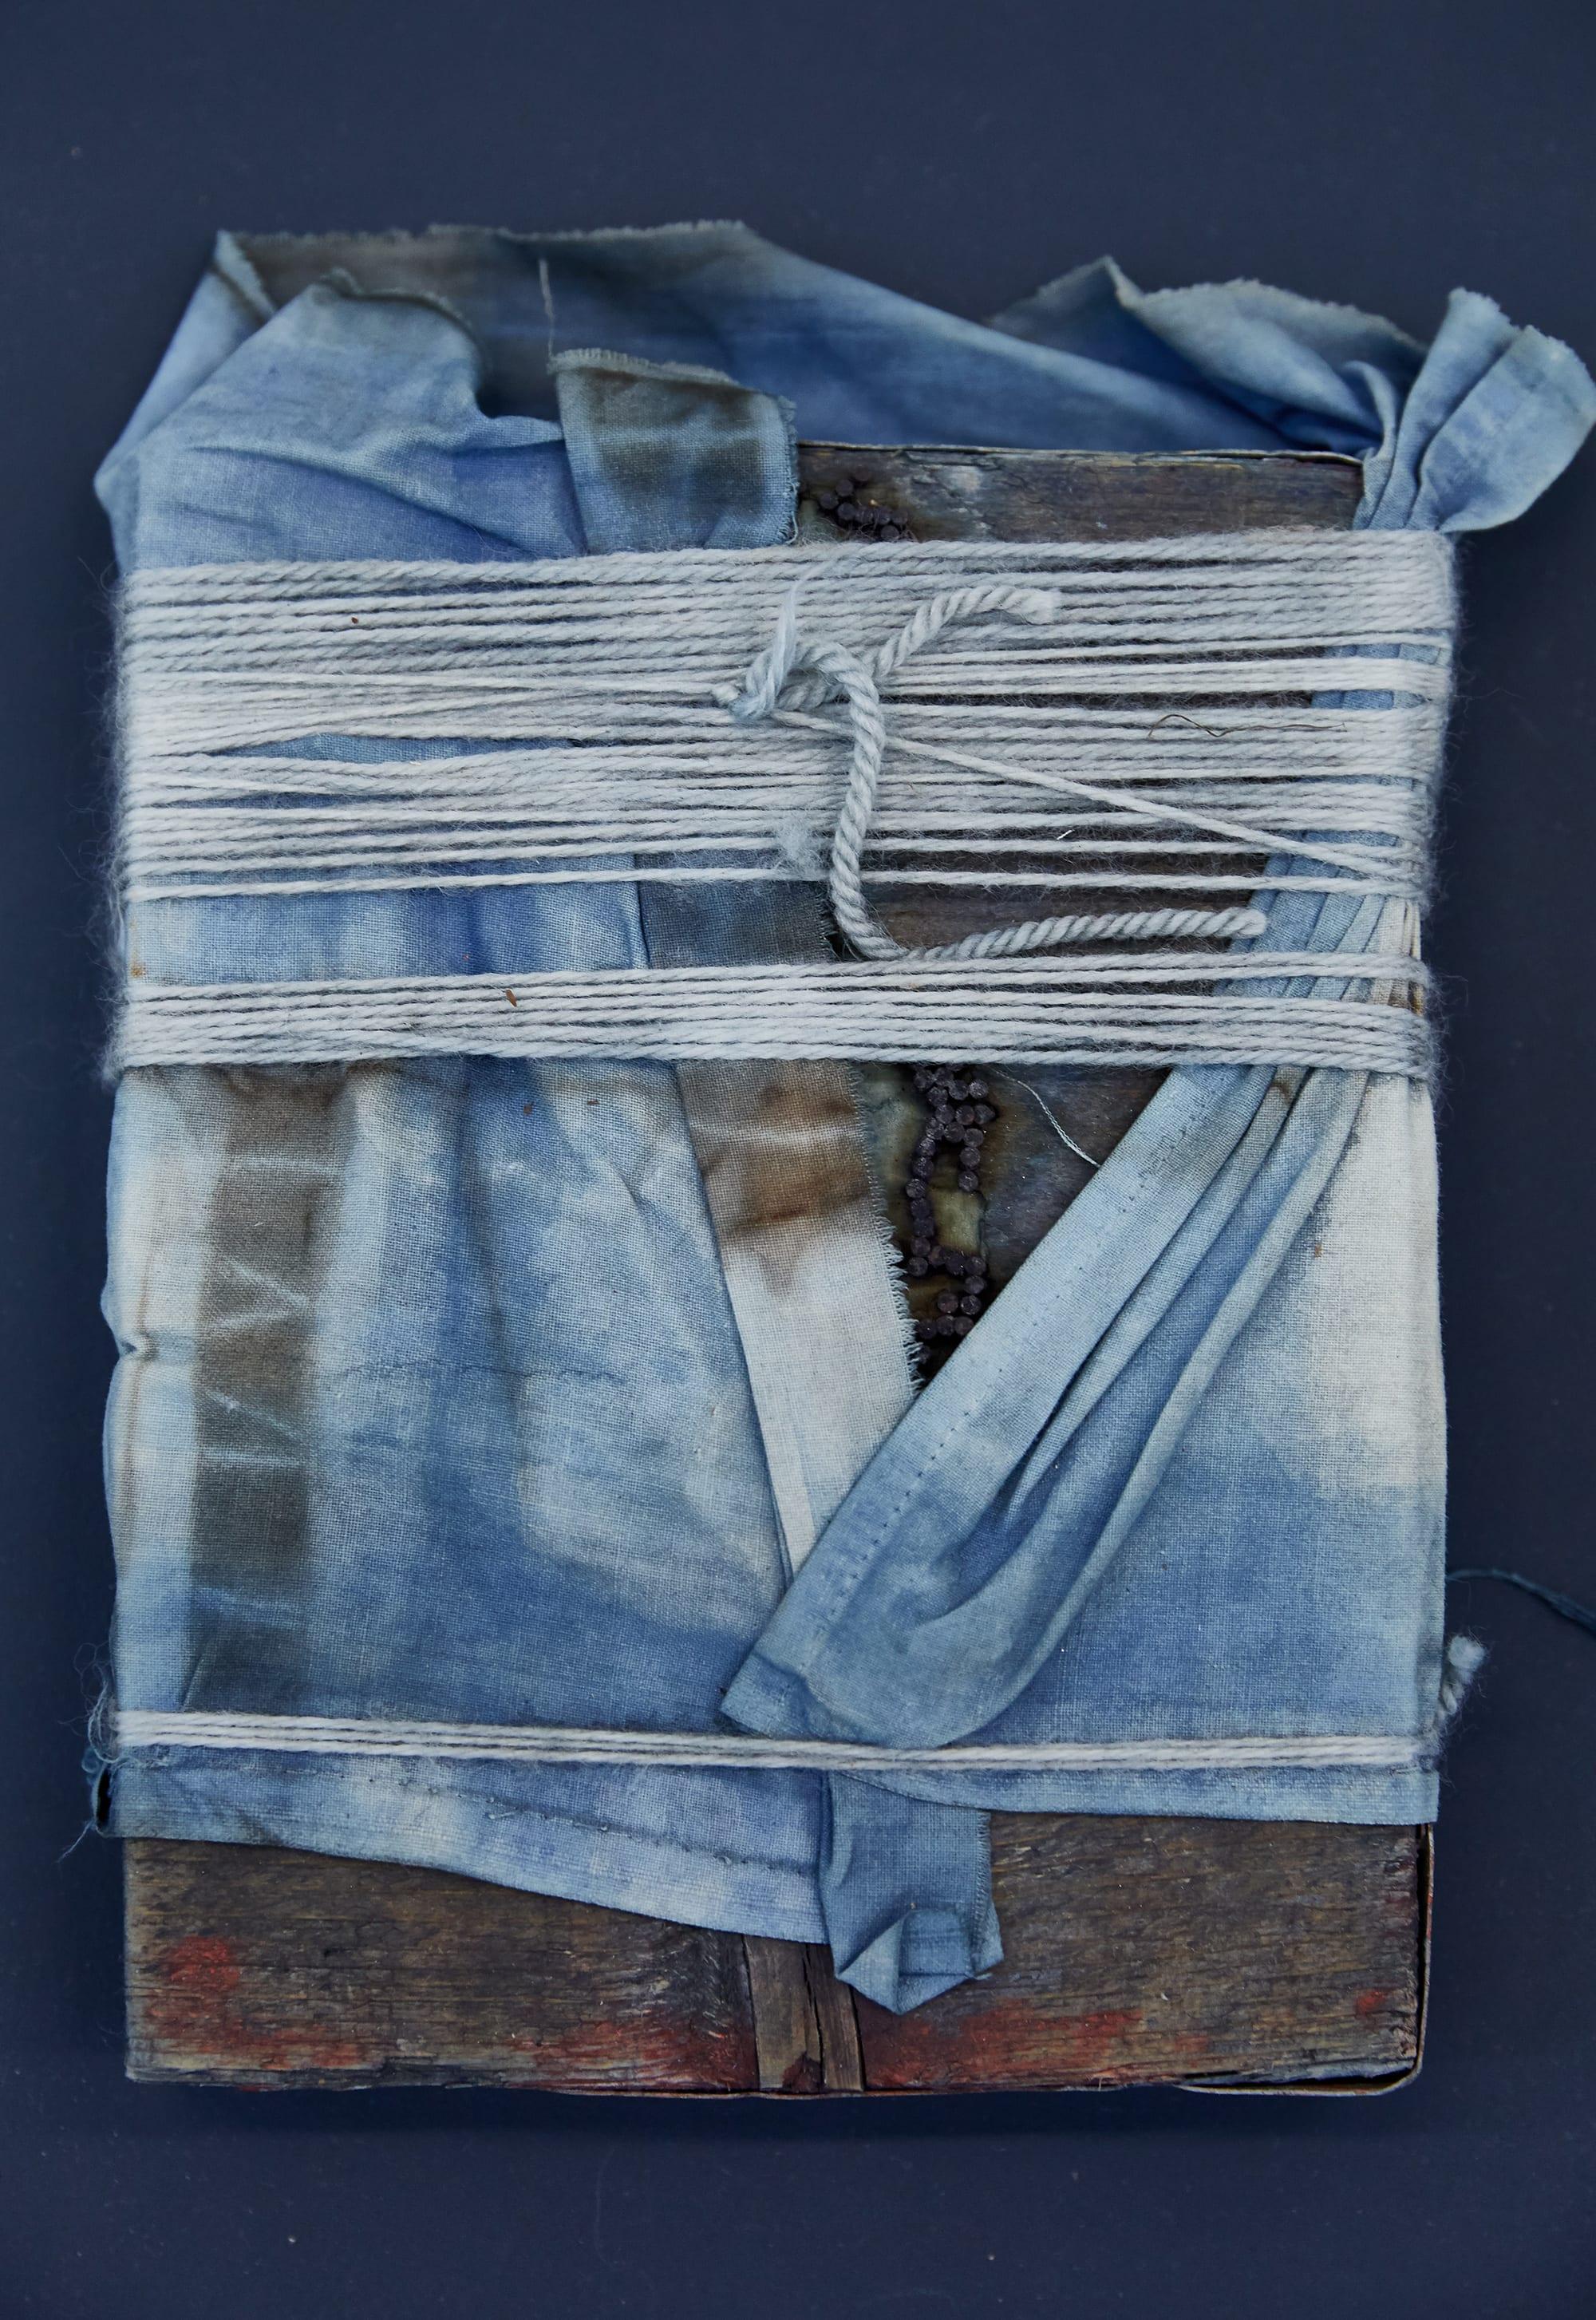 Chelsea-College-of-Arts-MA-Textile-Design-EMMA-MCGINN-2.jpg